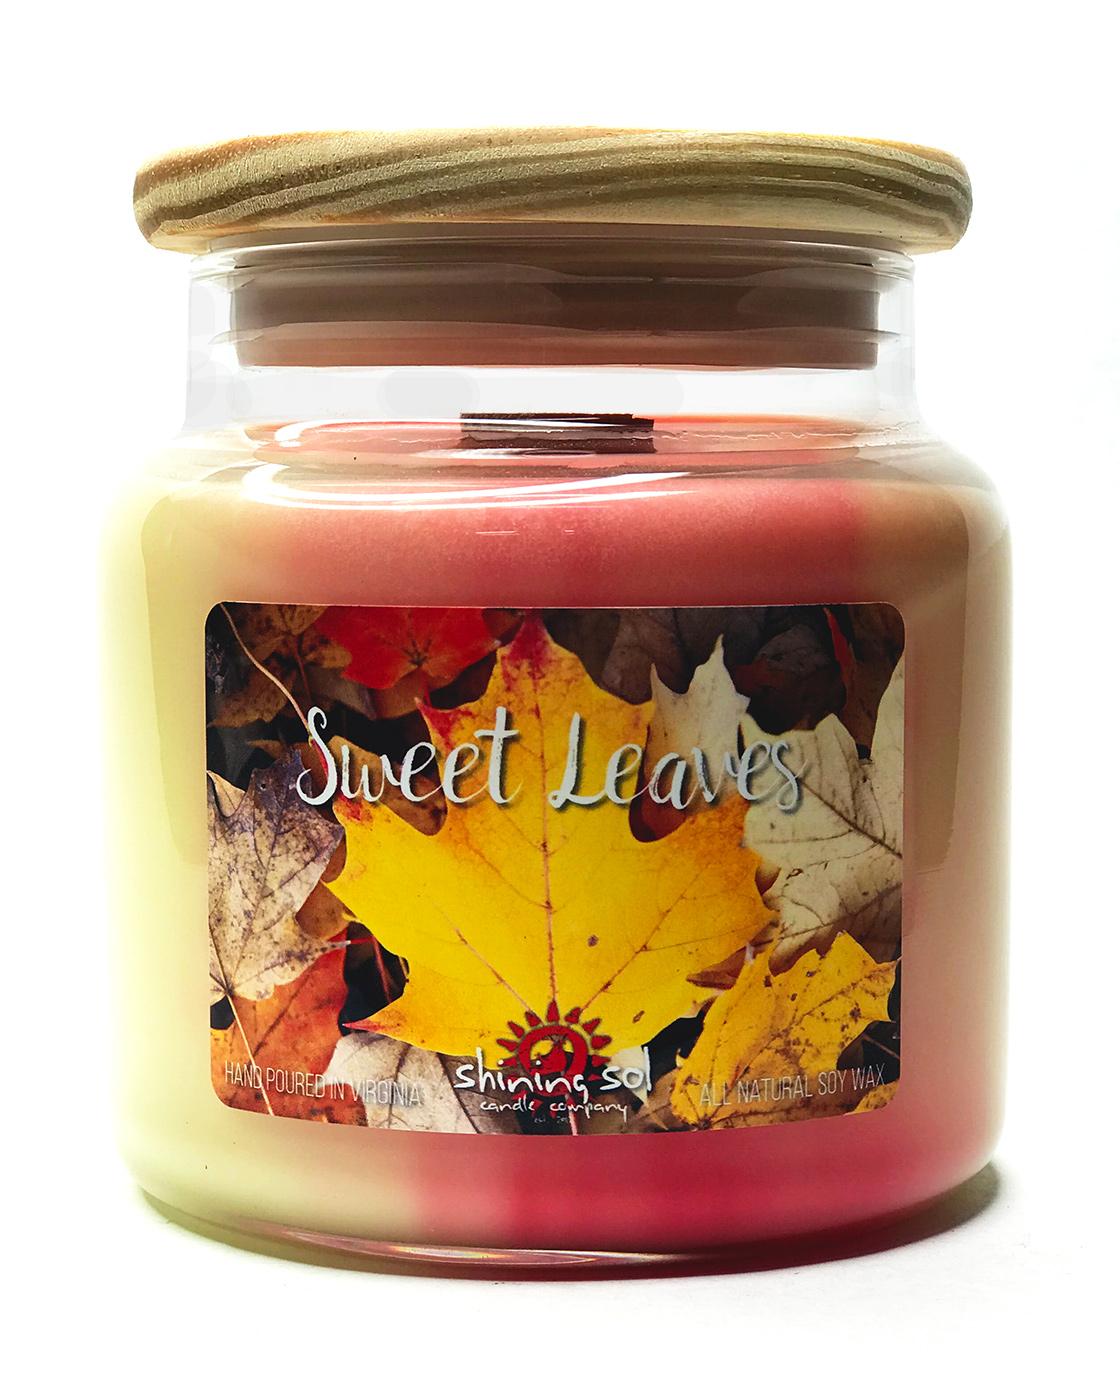 Sweet Leaves - Large Jar Candle